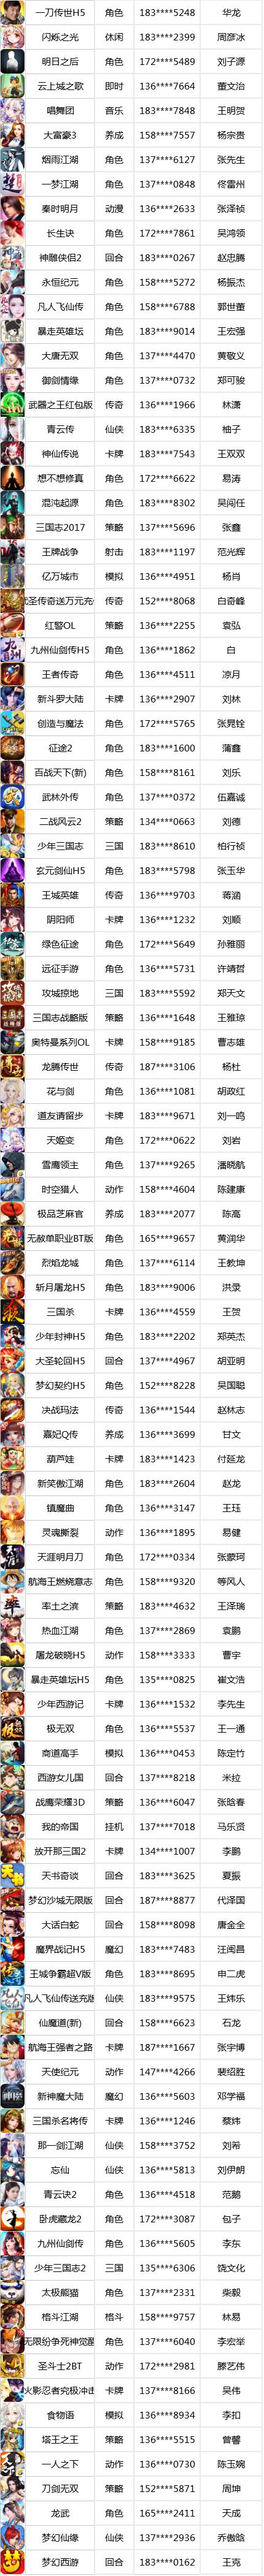 GS带队名单(图1)